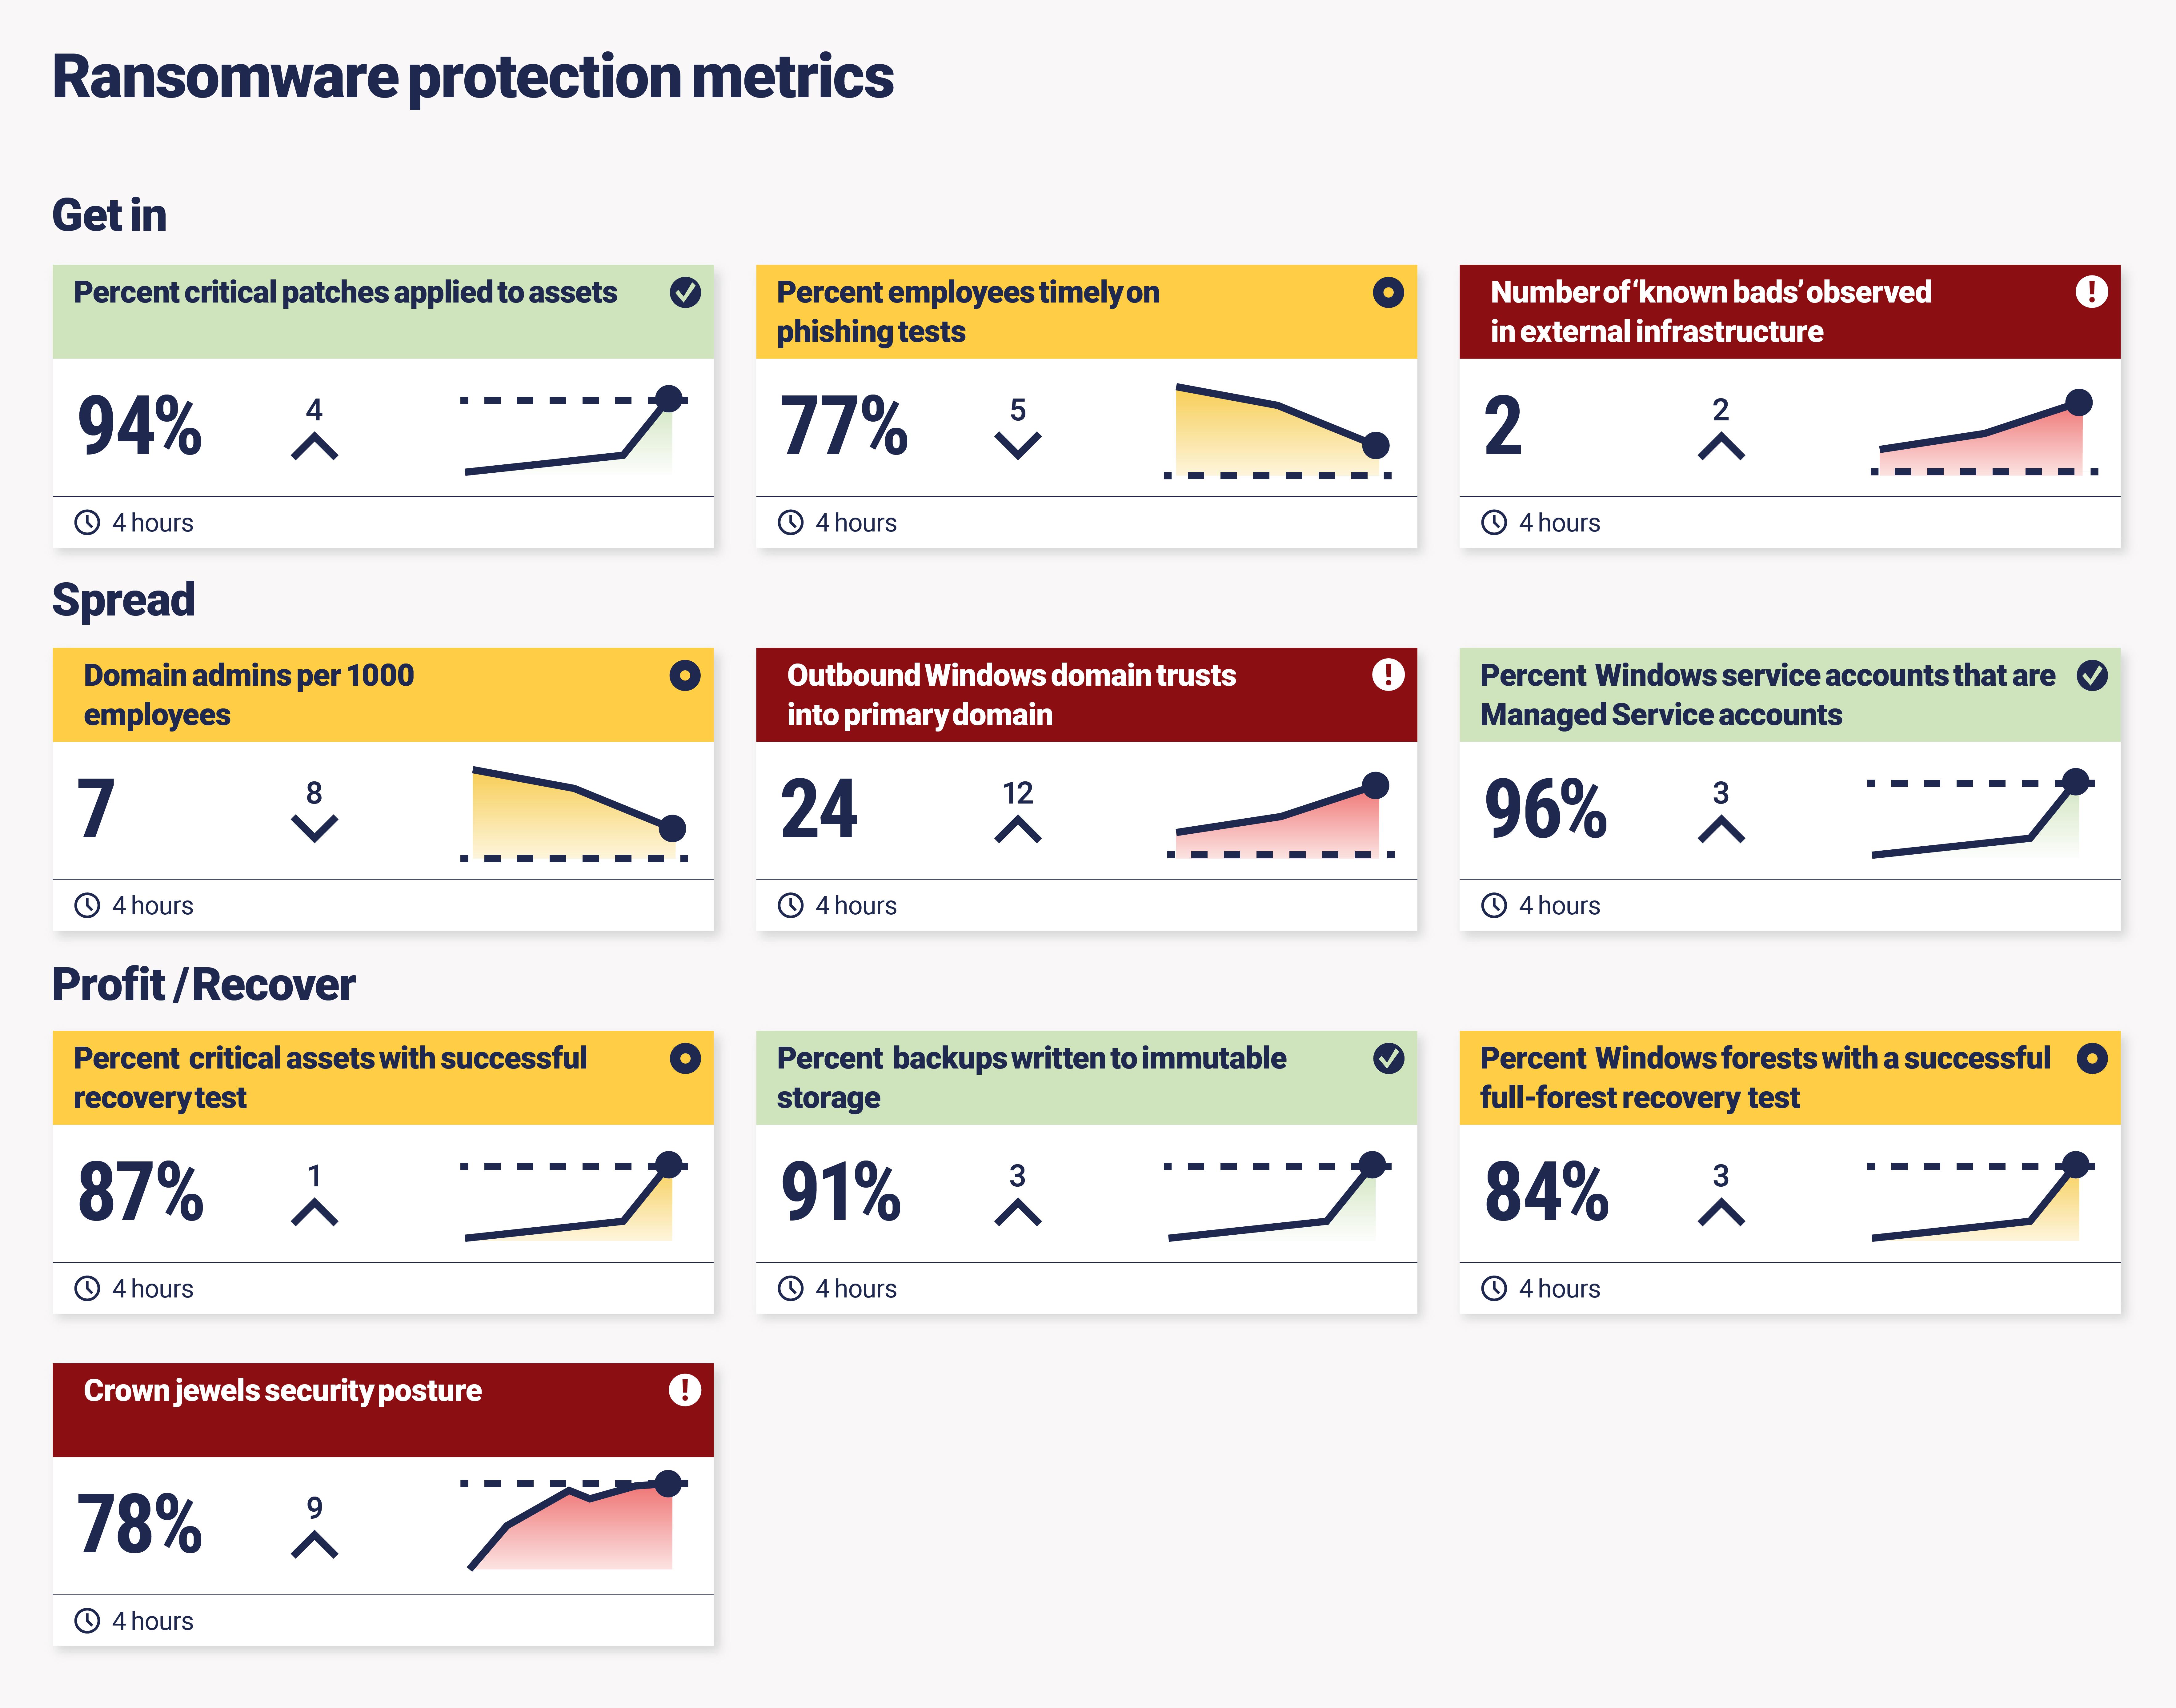 Ransomware protection metrics dashboard